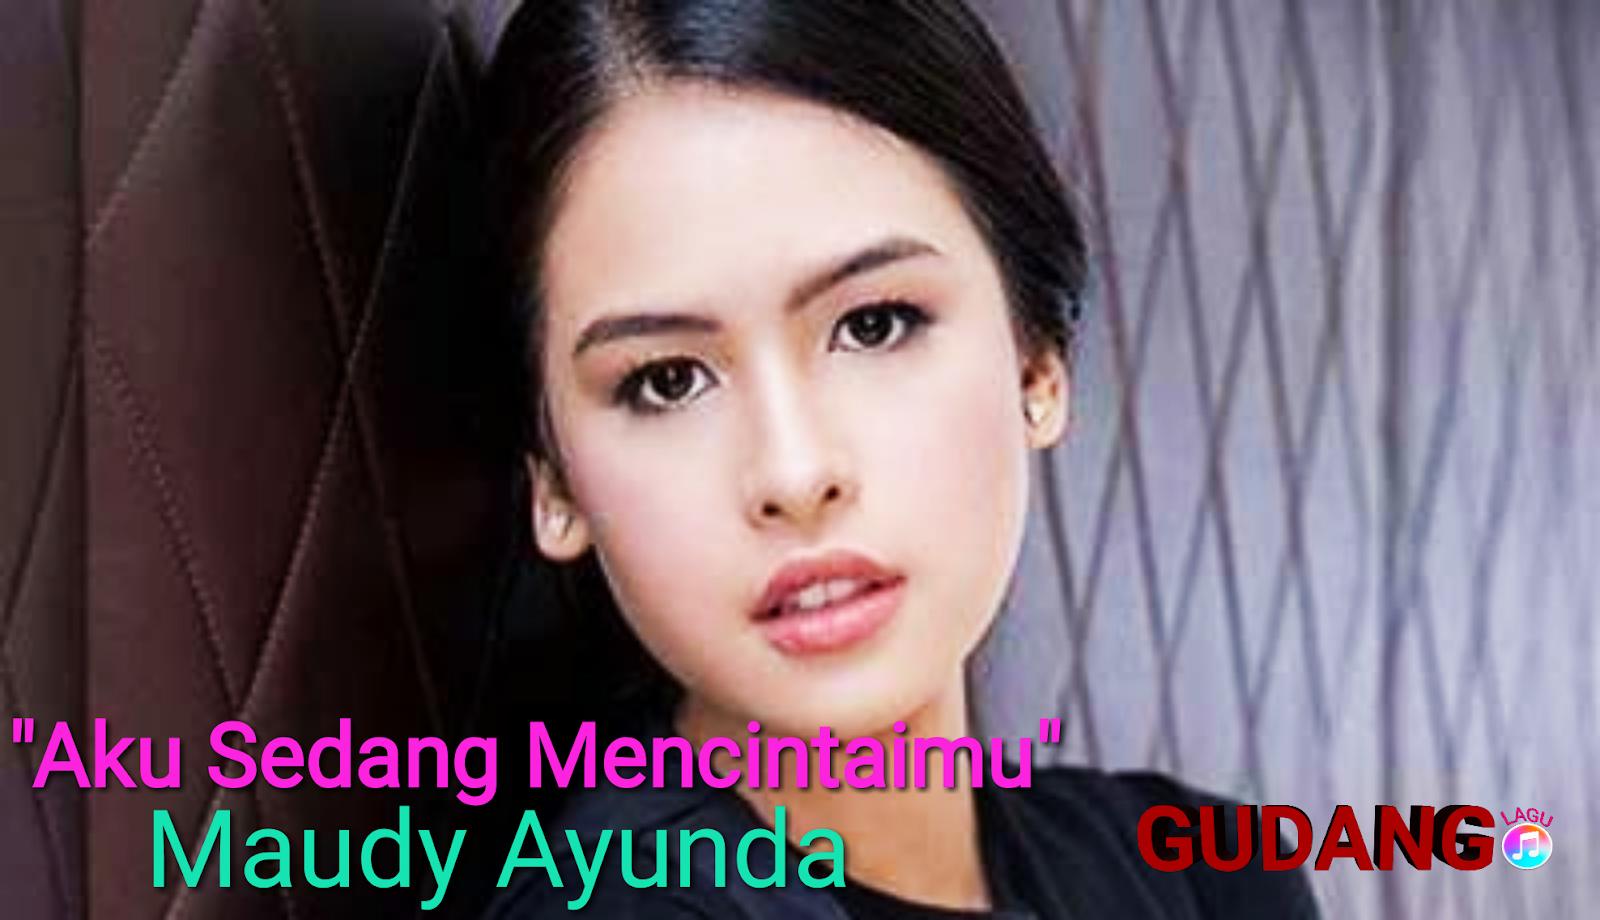 Maudy Ayunda - Aku Sedang Mencintaimu